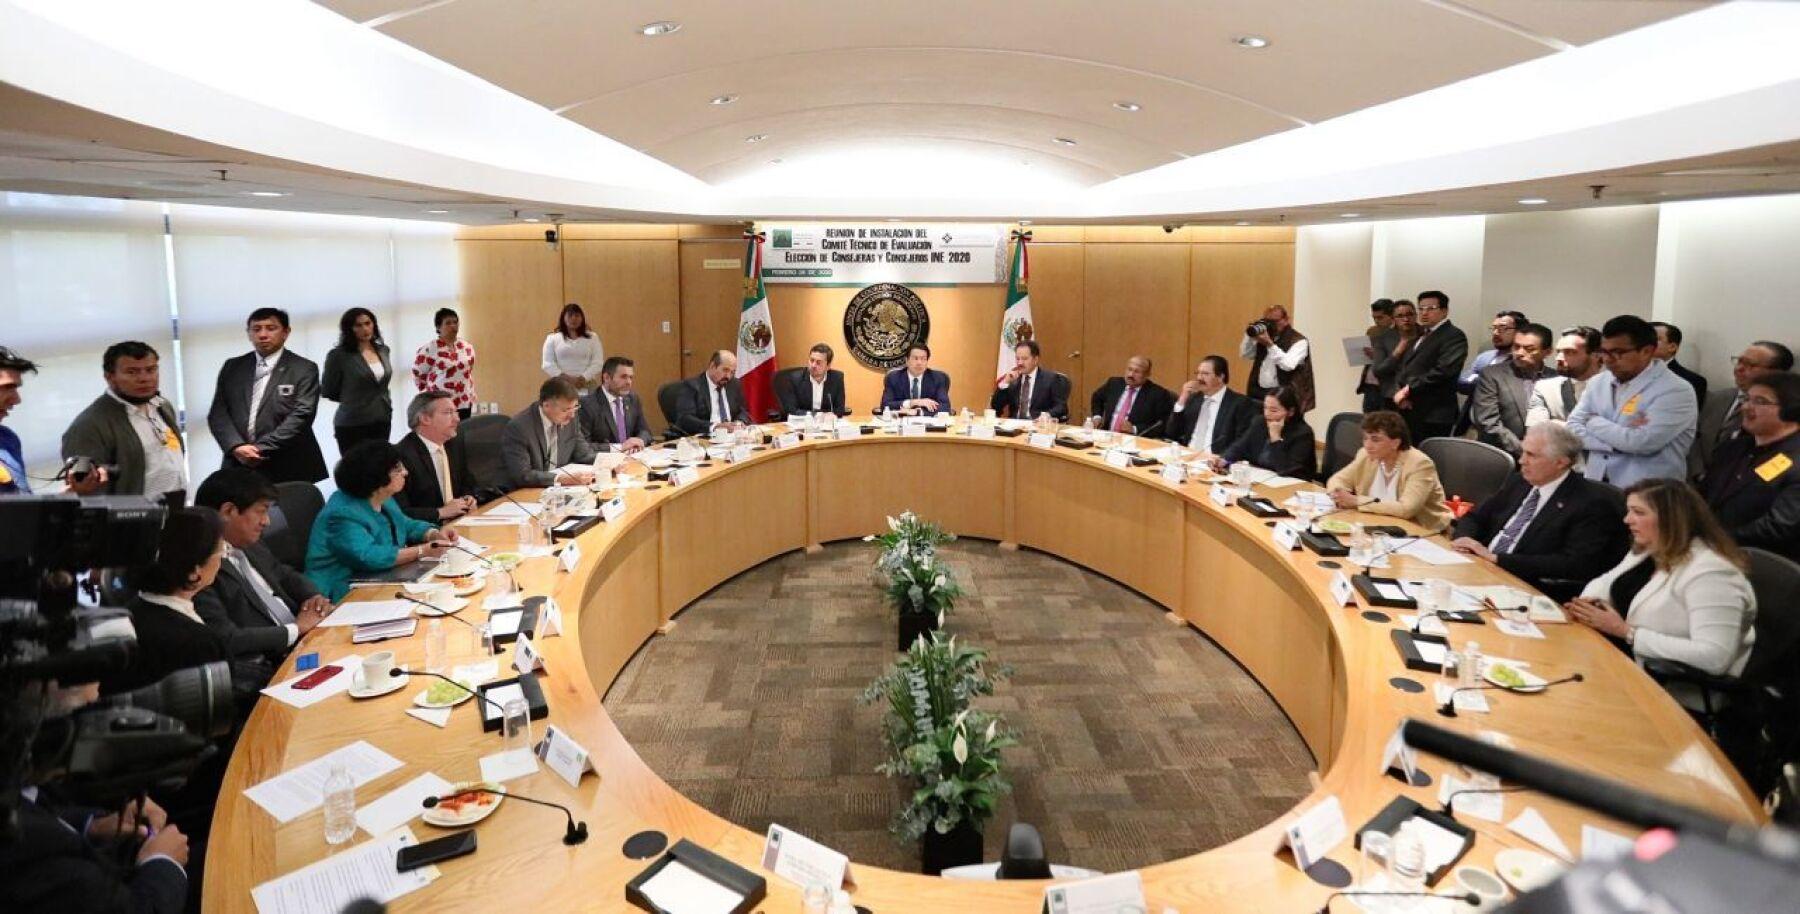 comité técnico ine coronavirus